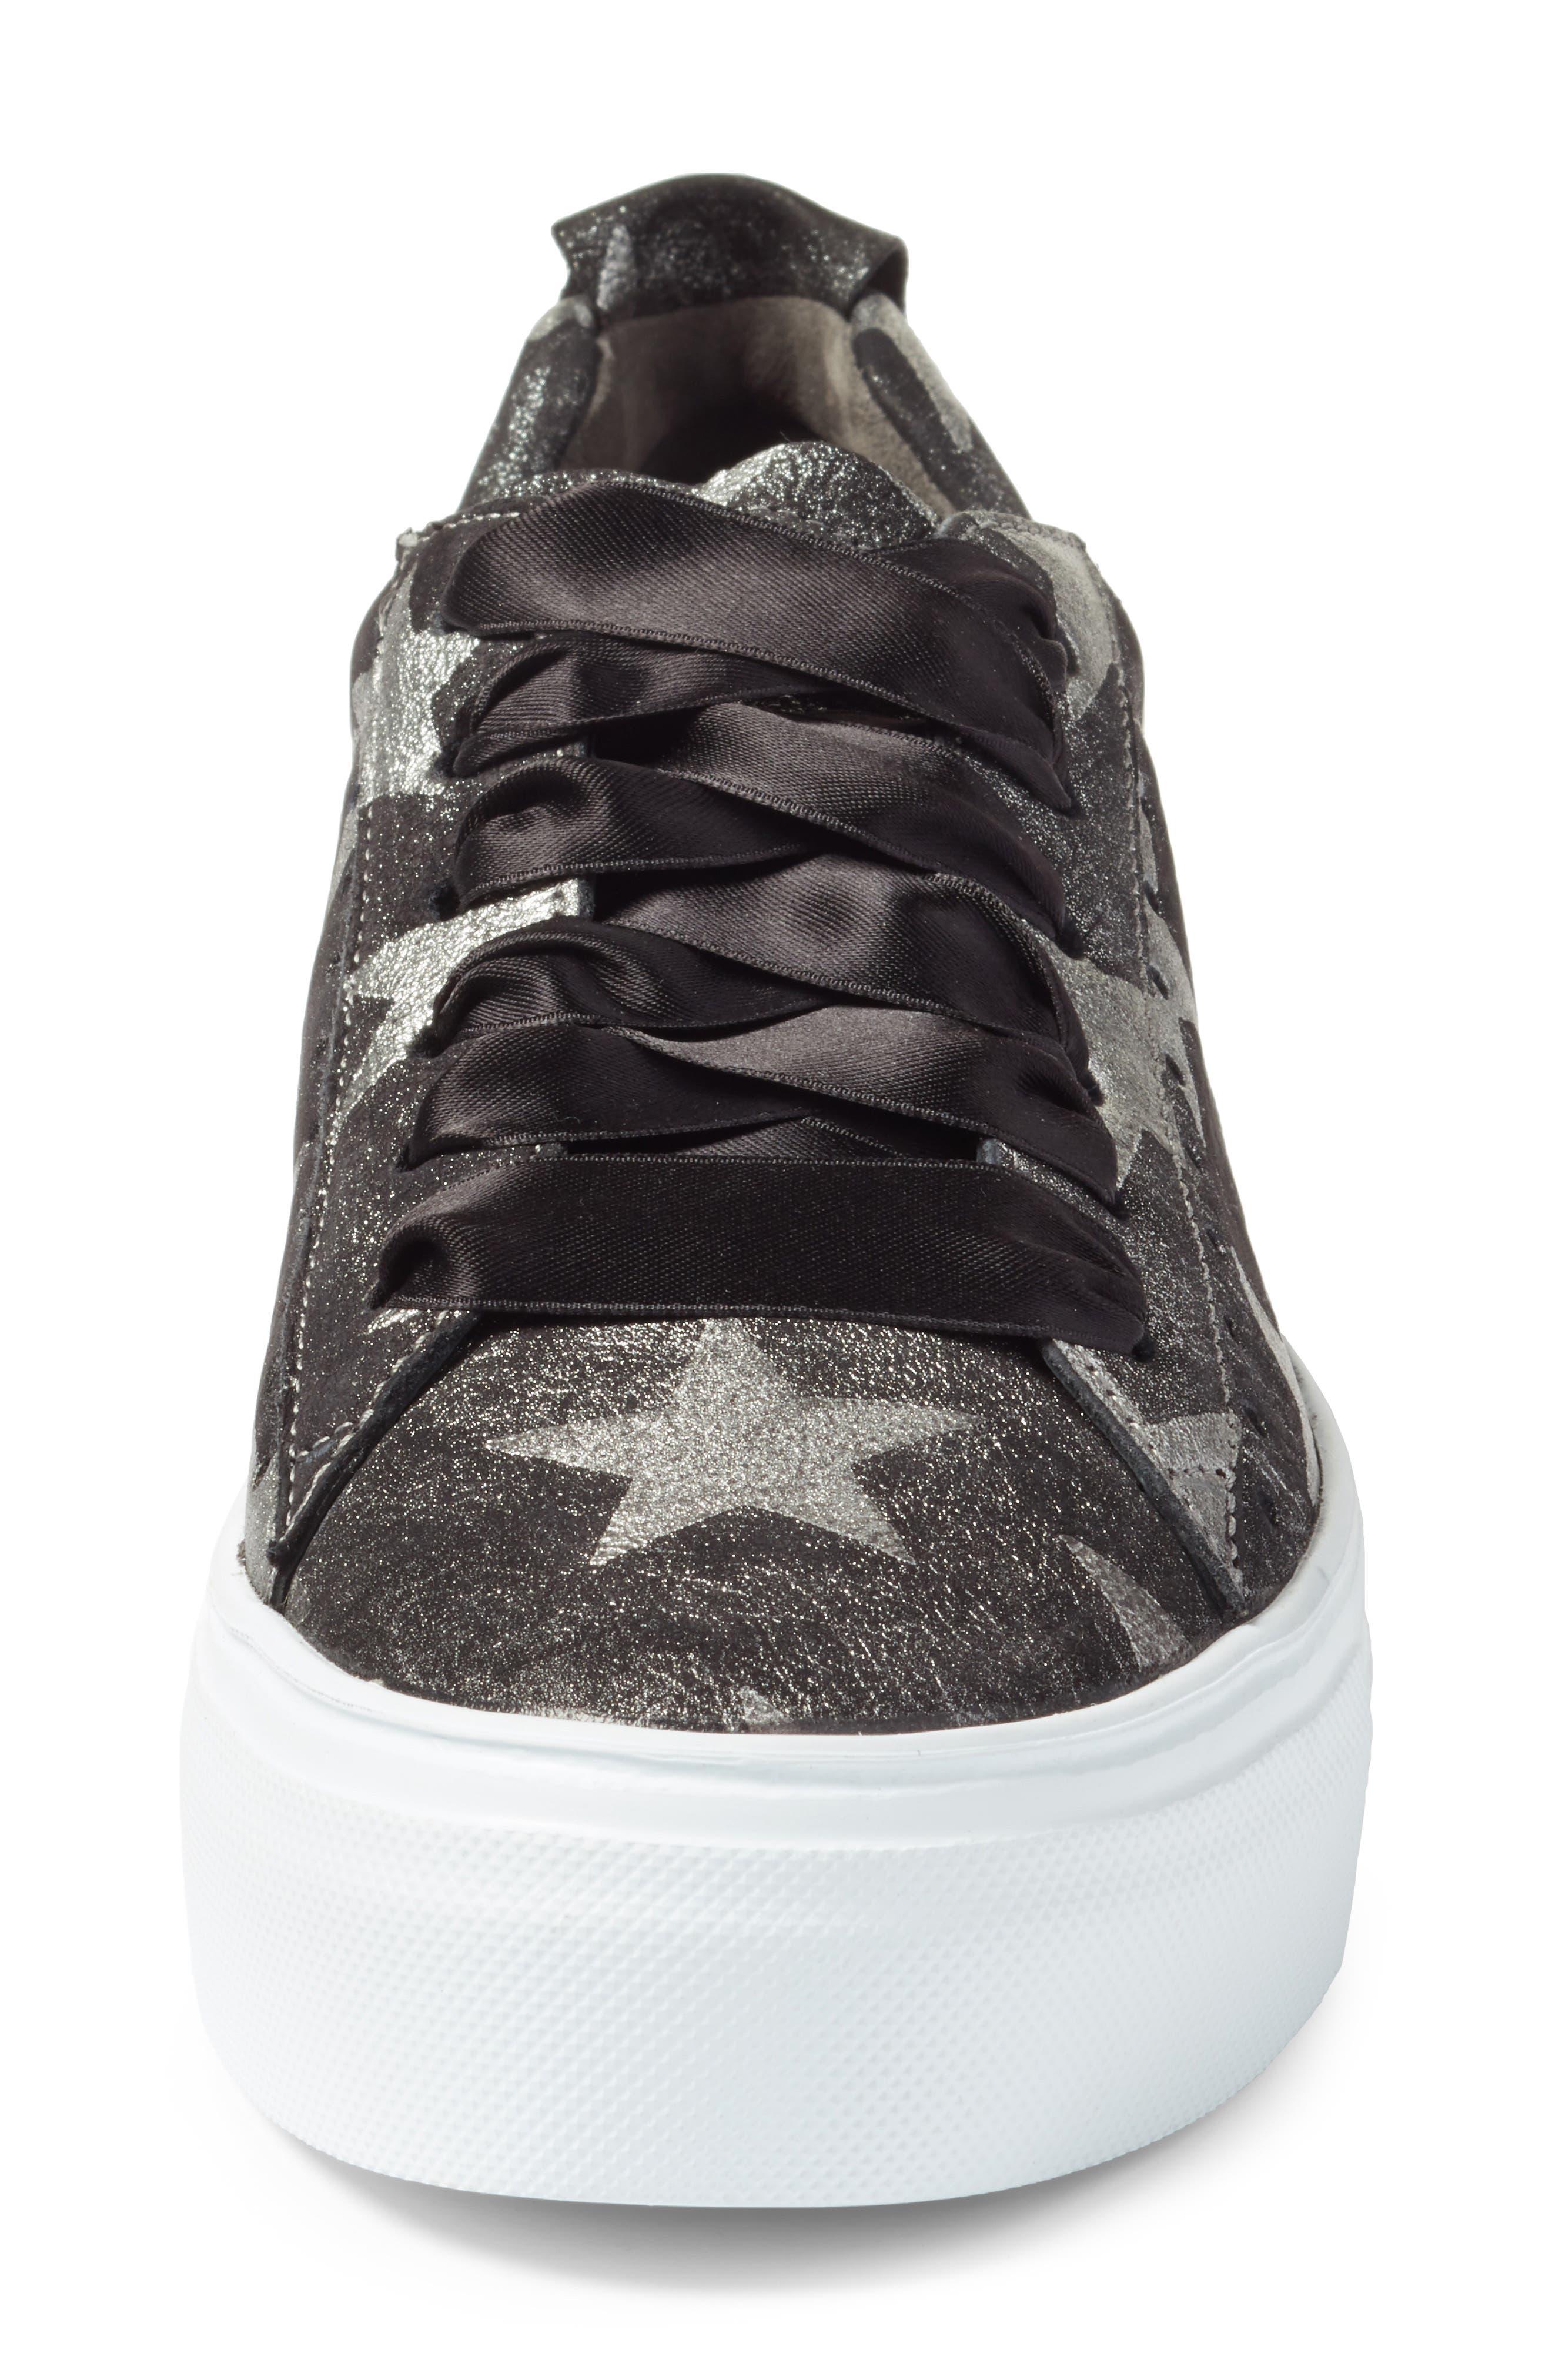 Kennel & Schmenger Big Star Sneaker,                             Alternate thumbnail 4, color,                             001